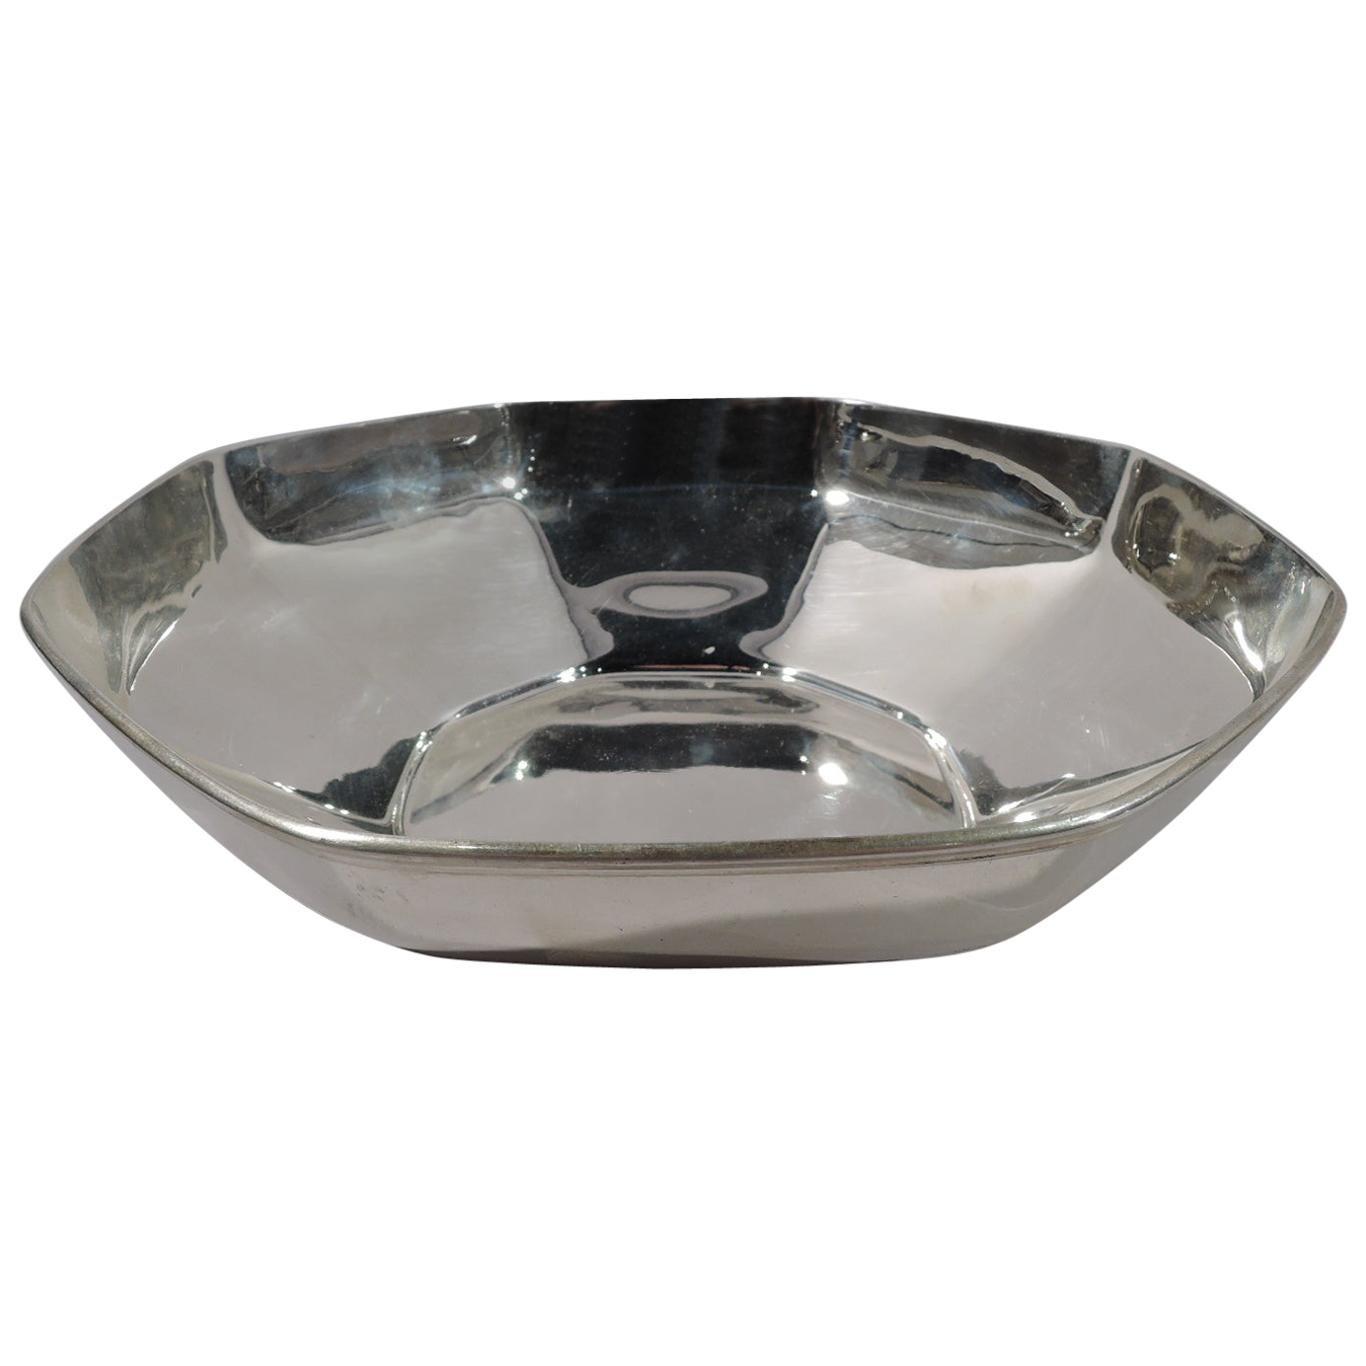 Tiffany & Co. American Art Deco Sterling Silver Bowl